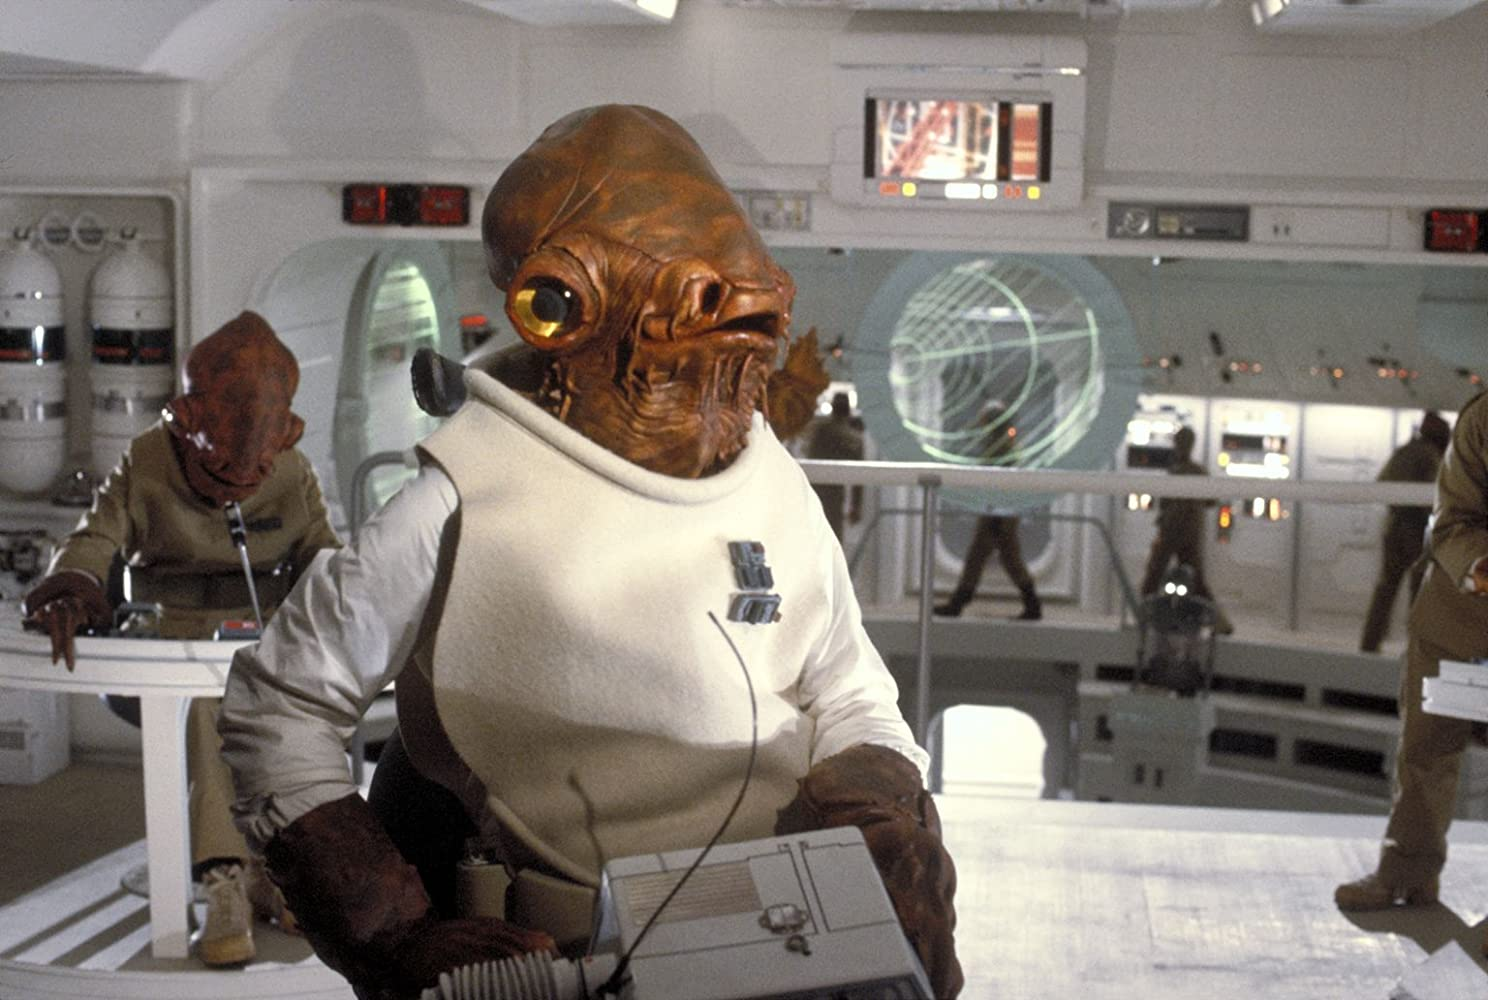 Tim Rose in Star Wars: Episode VI - Return of the Jedi (1983)